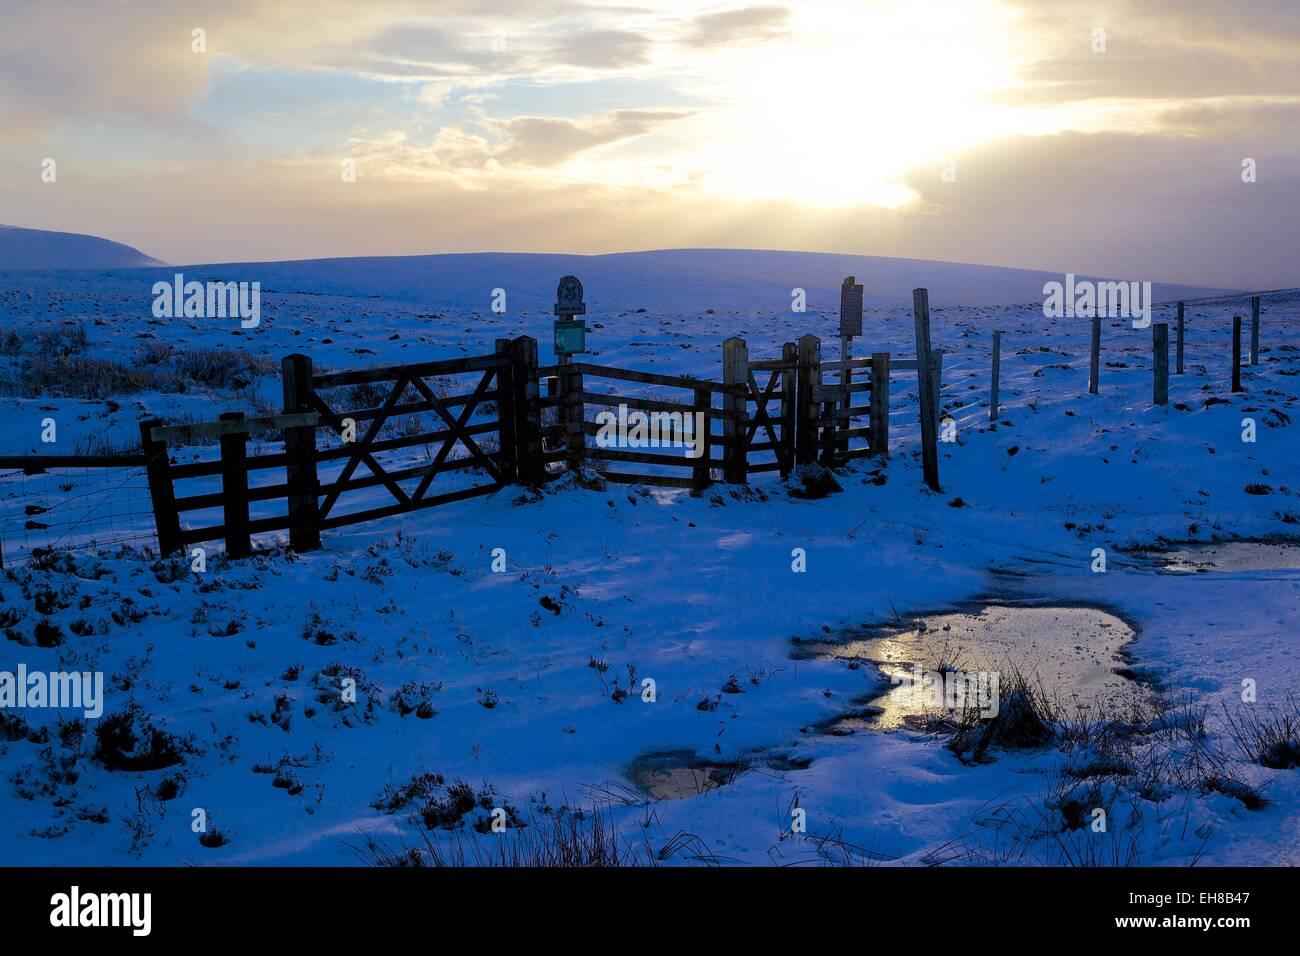 Kinder Scout Pennine Way in winter, Peak District National Park, Derbyshire, England, United Kingdom, Europe - Stock Image